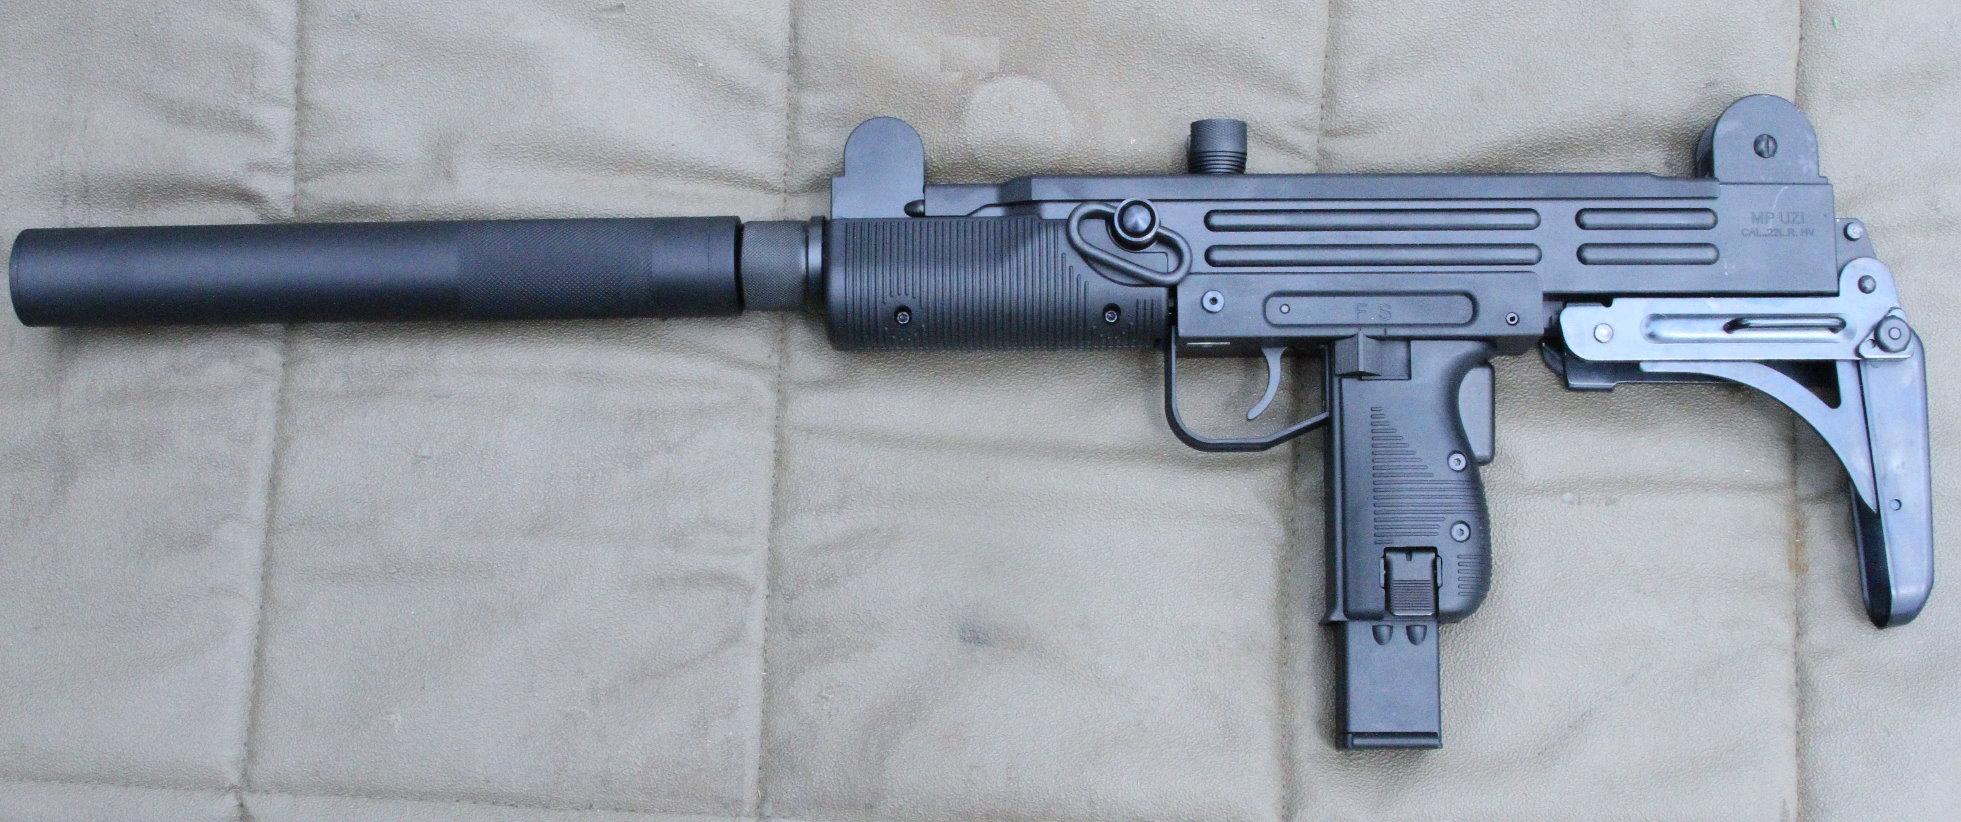 Walther 22lr Uzi Copy New Gun Review Gunsamerica Digest Schematic